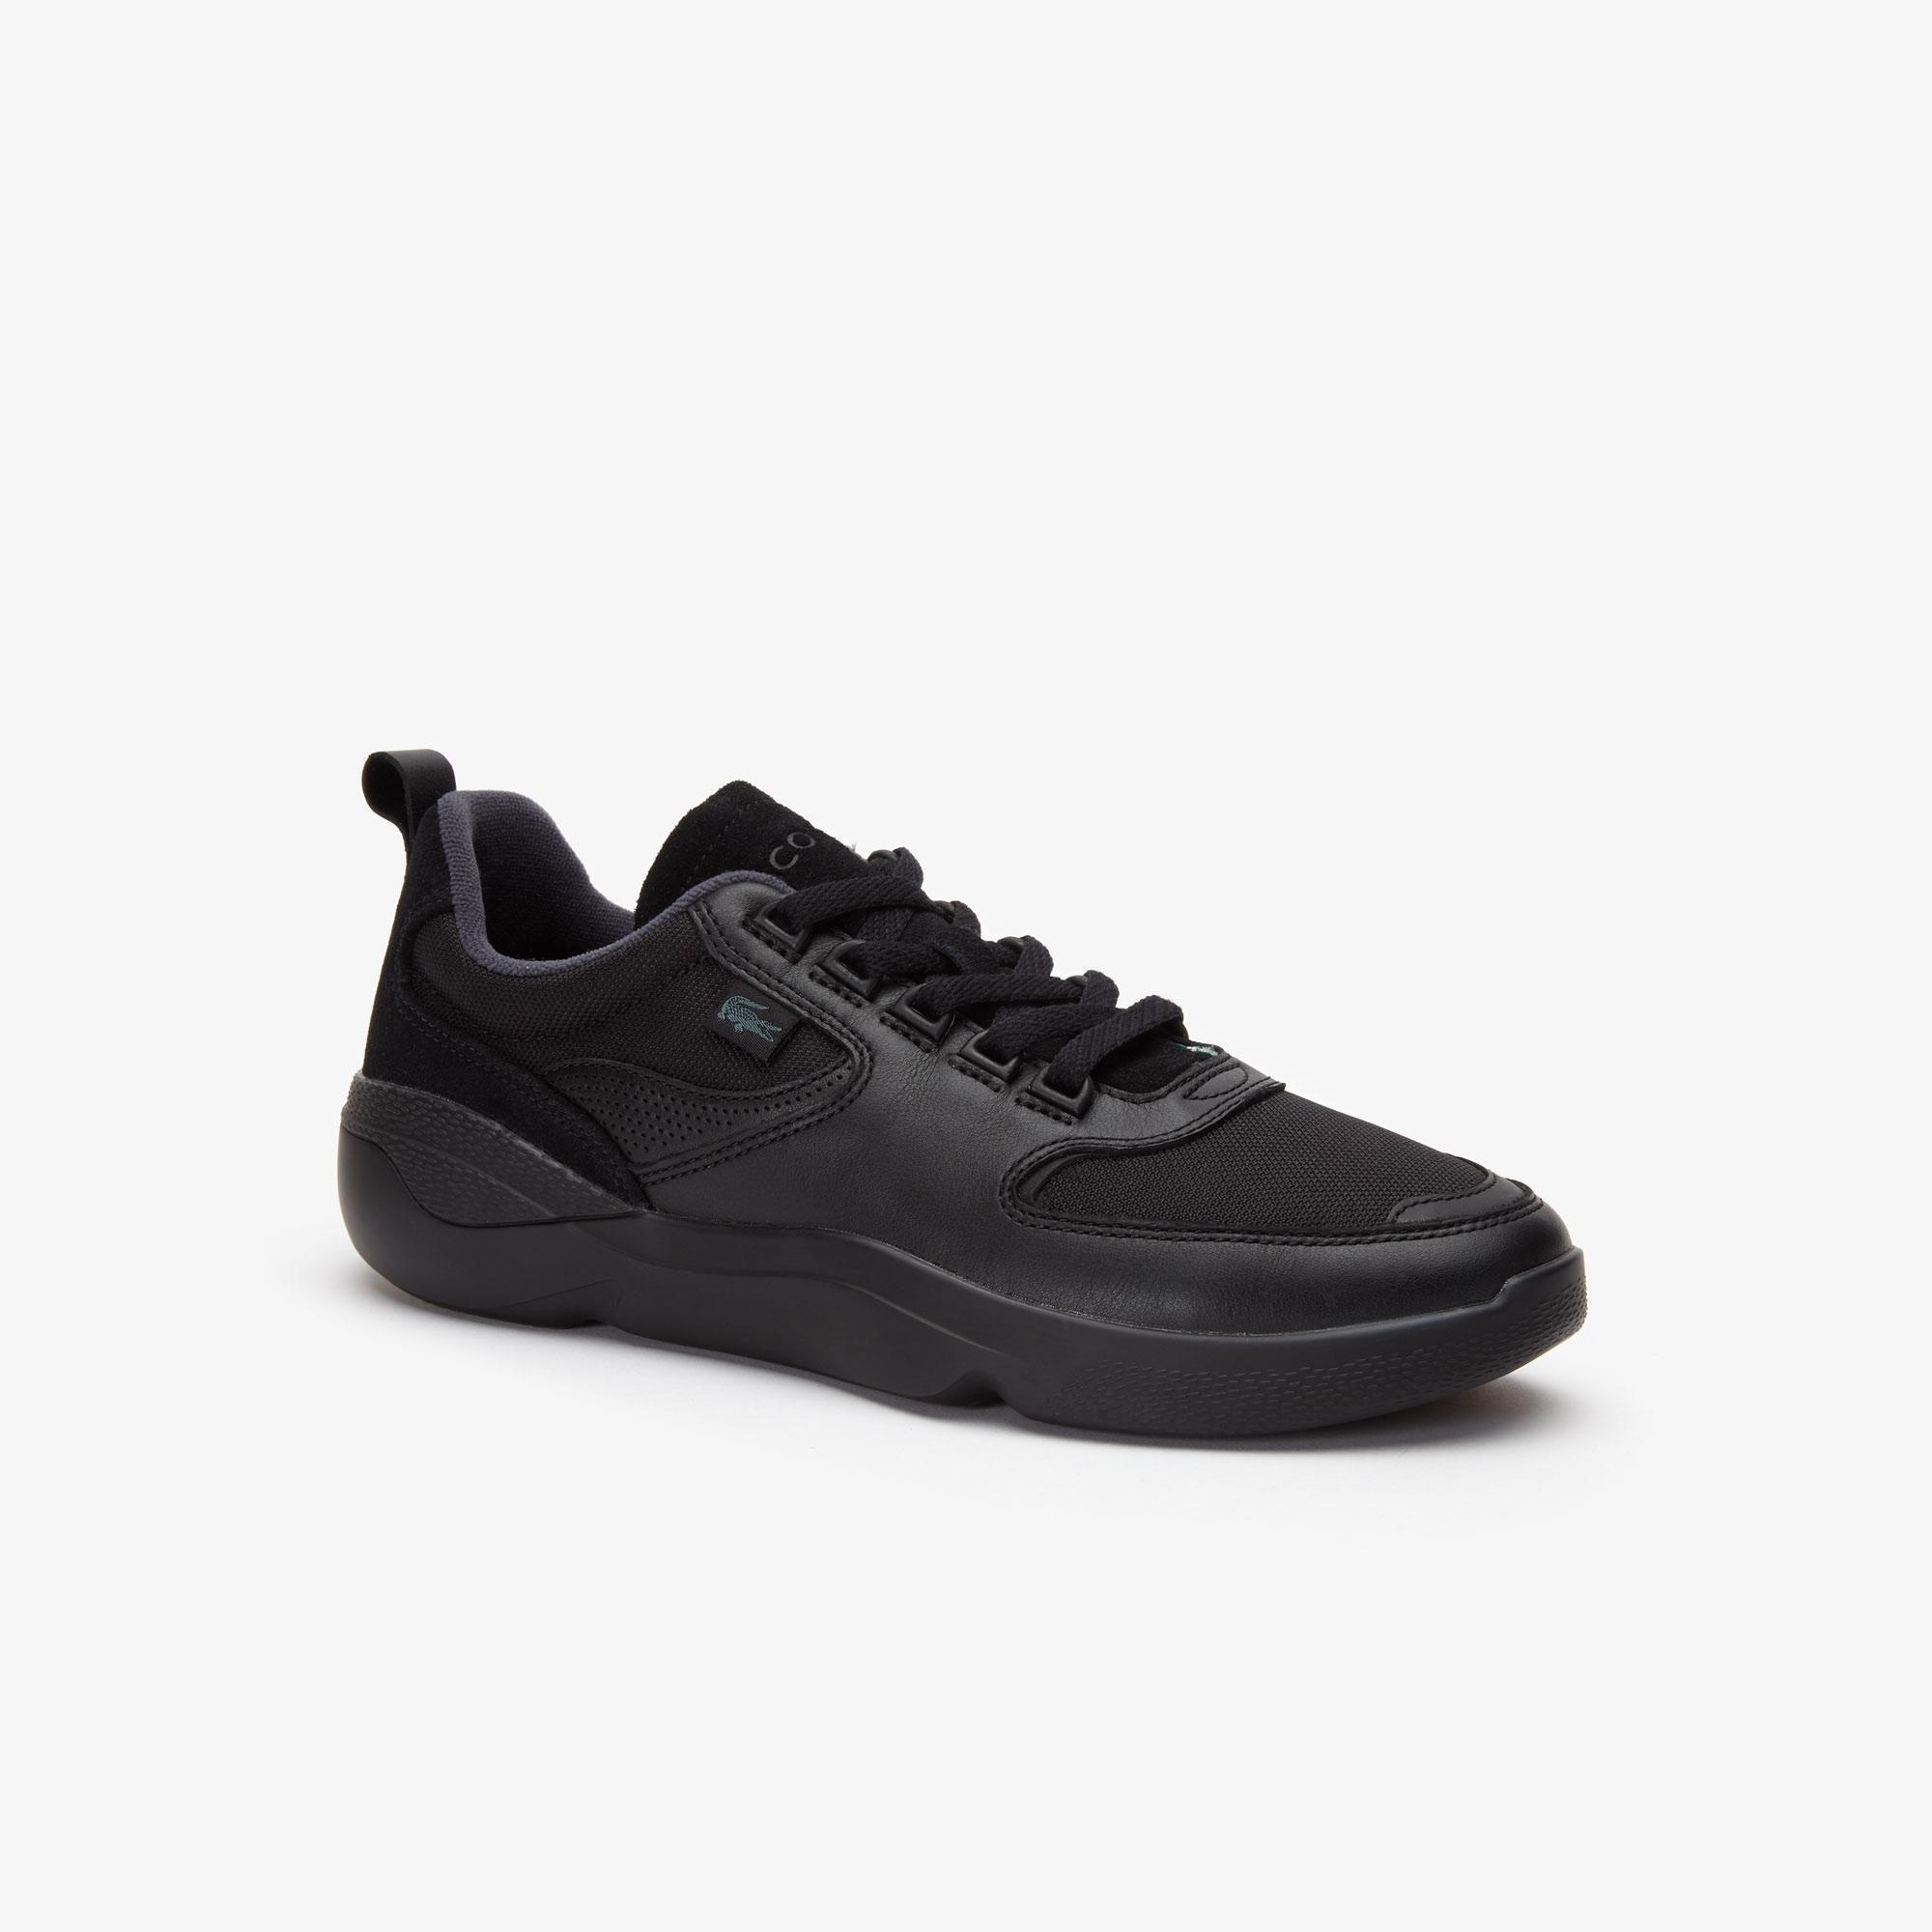 Lacoste Wildcard 319 1 Męskie Sneakersy